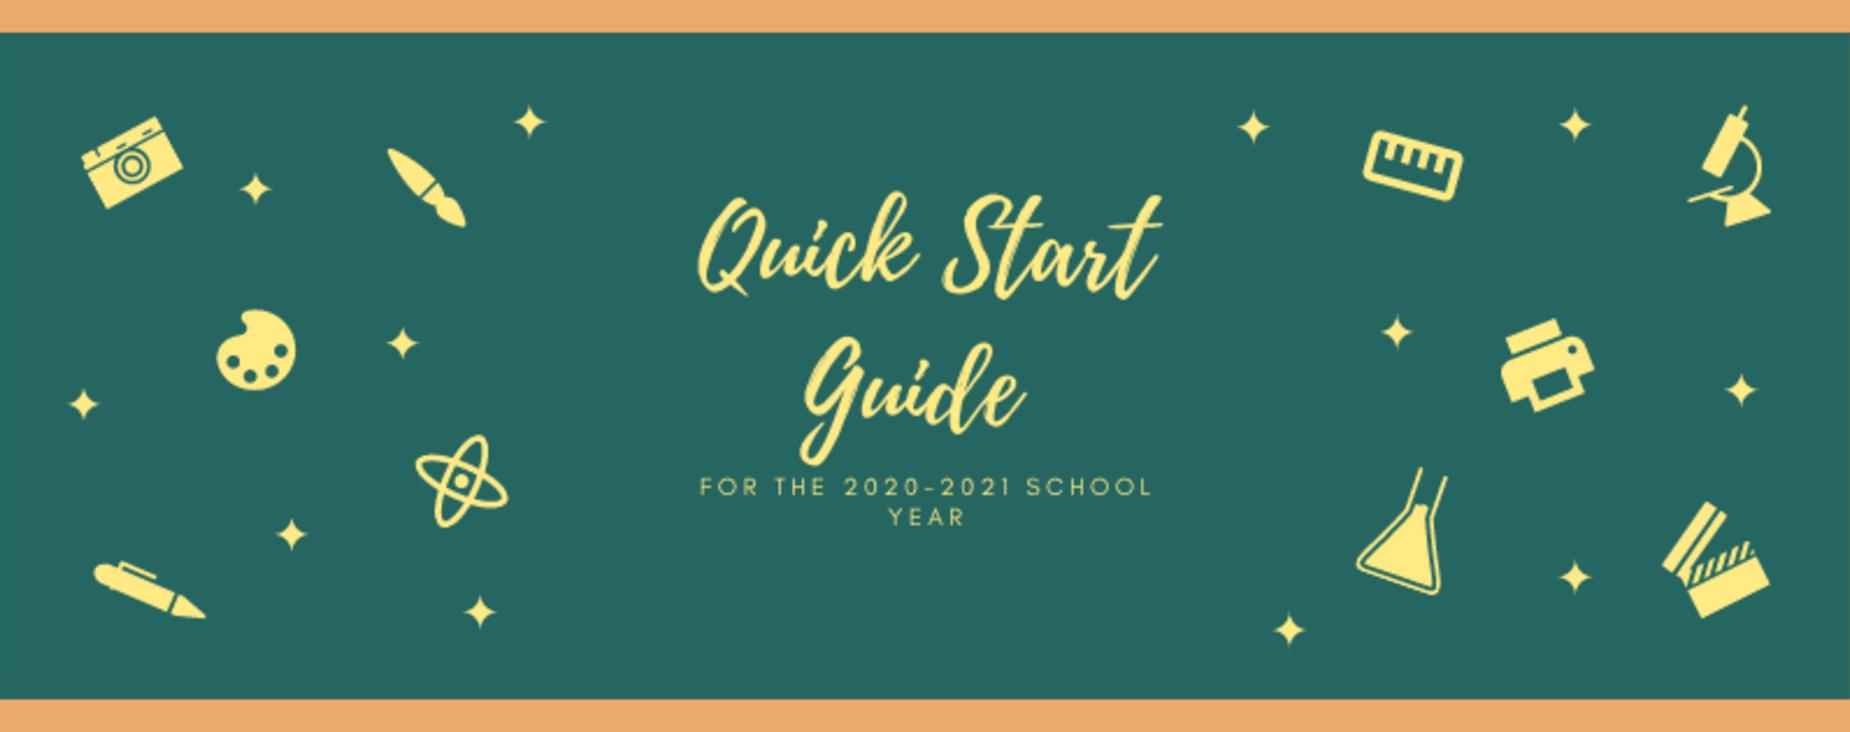 Quick Start Guide 20-21